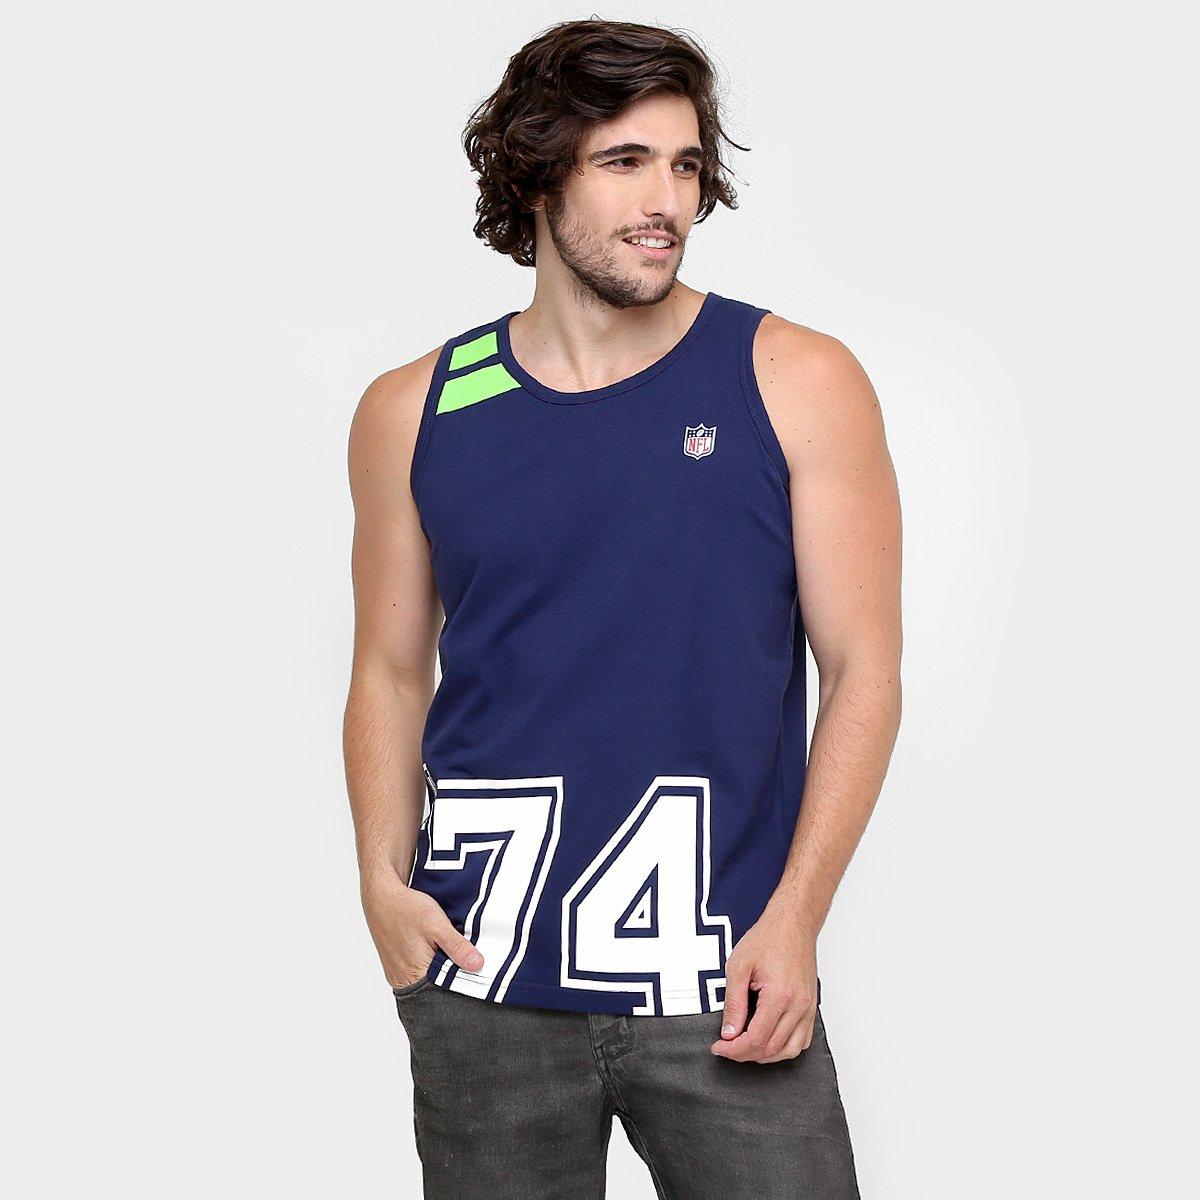 acff7f5de Camiseta Regata New Era NFL Big Dates Seattle Seahawks - Compre Agora